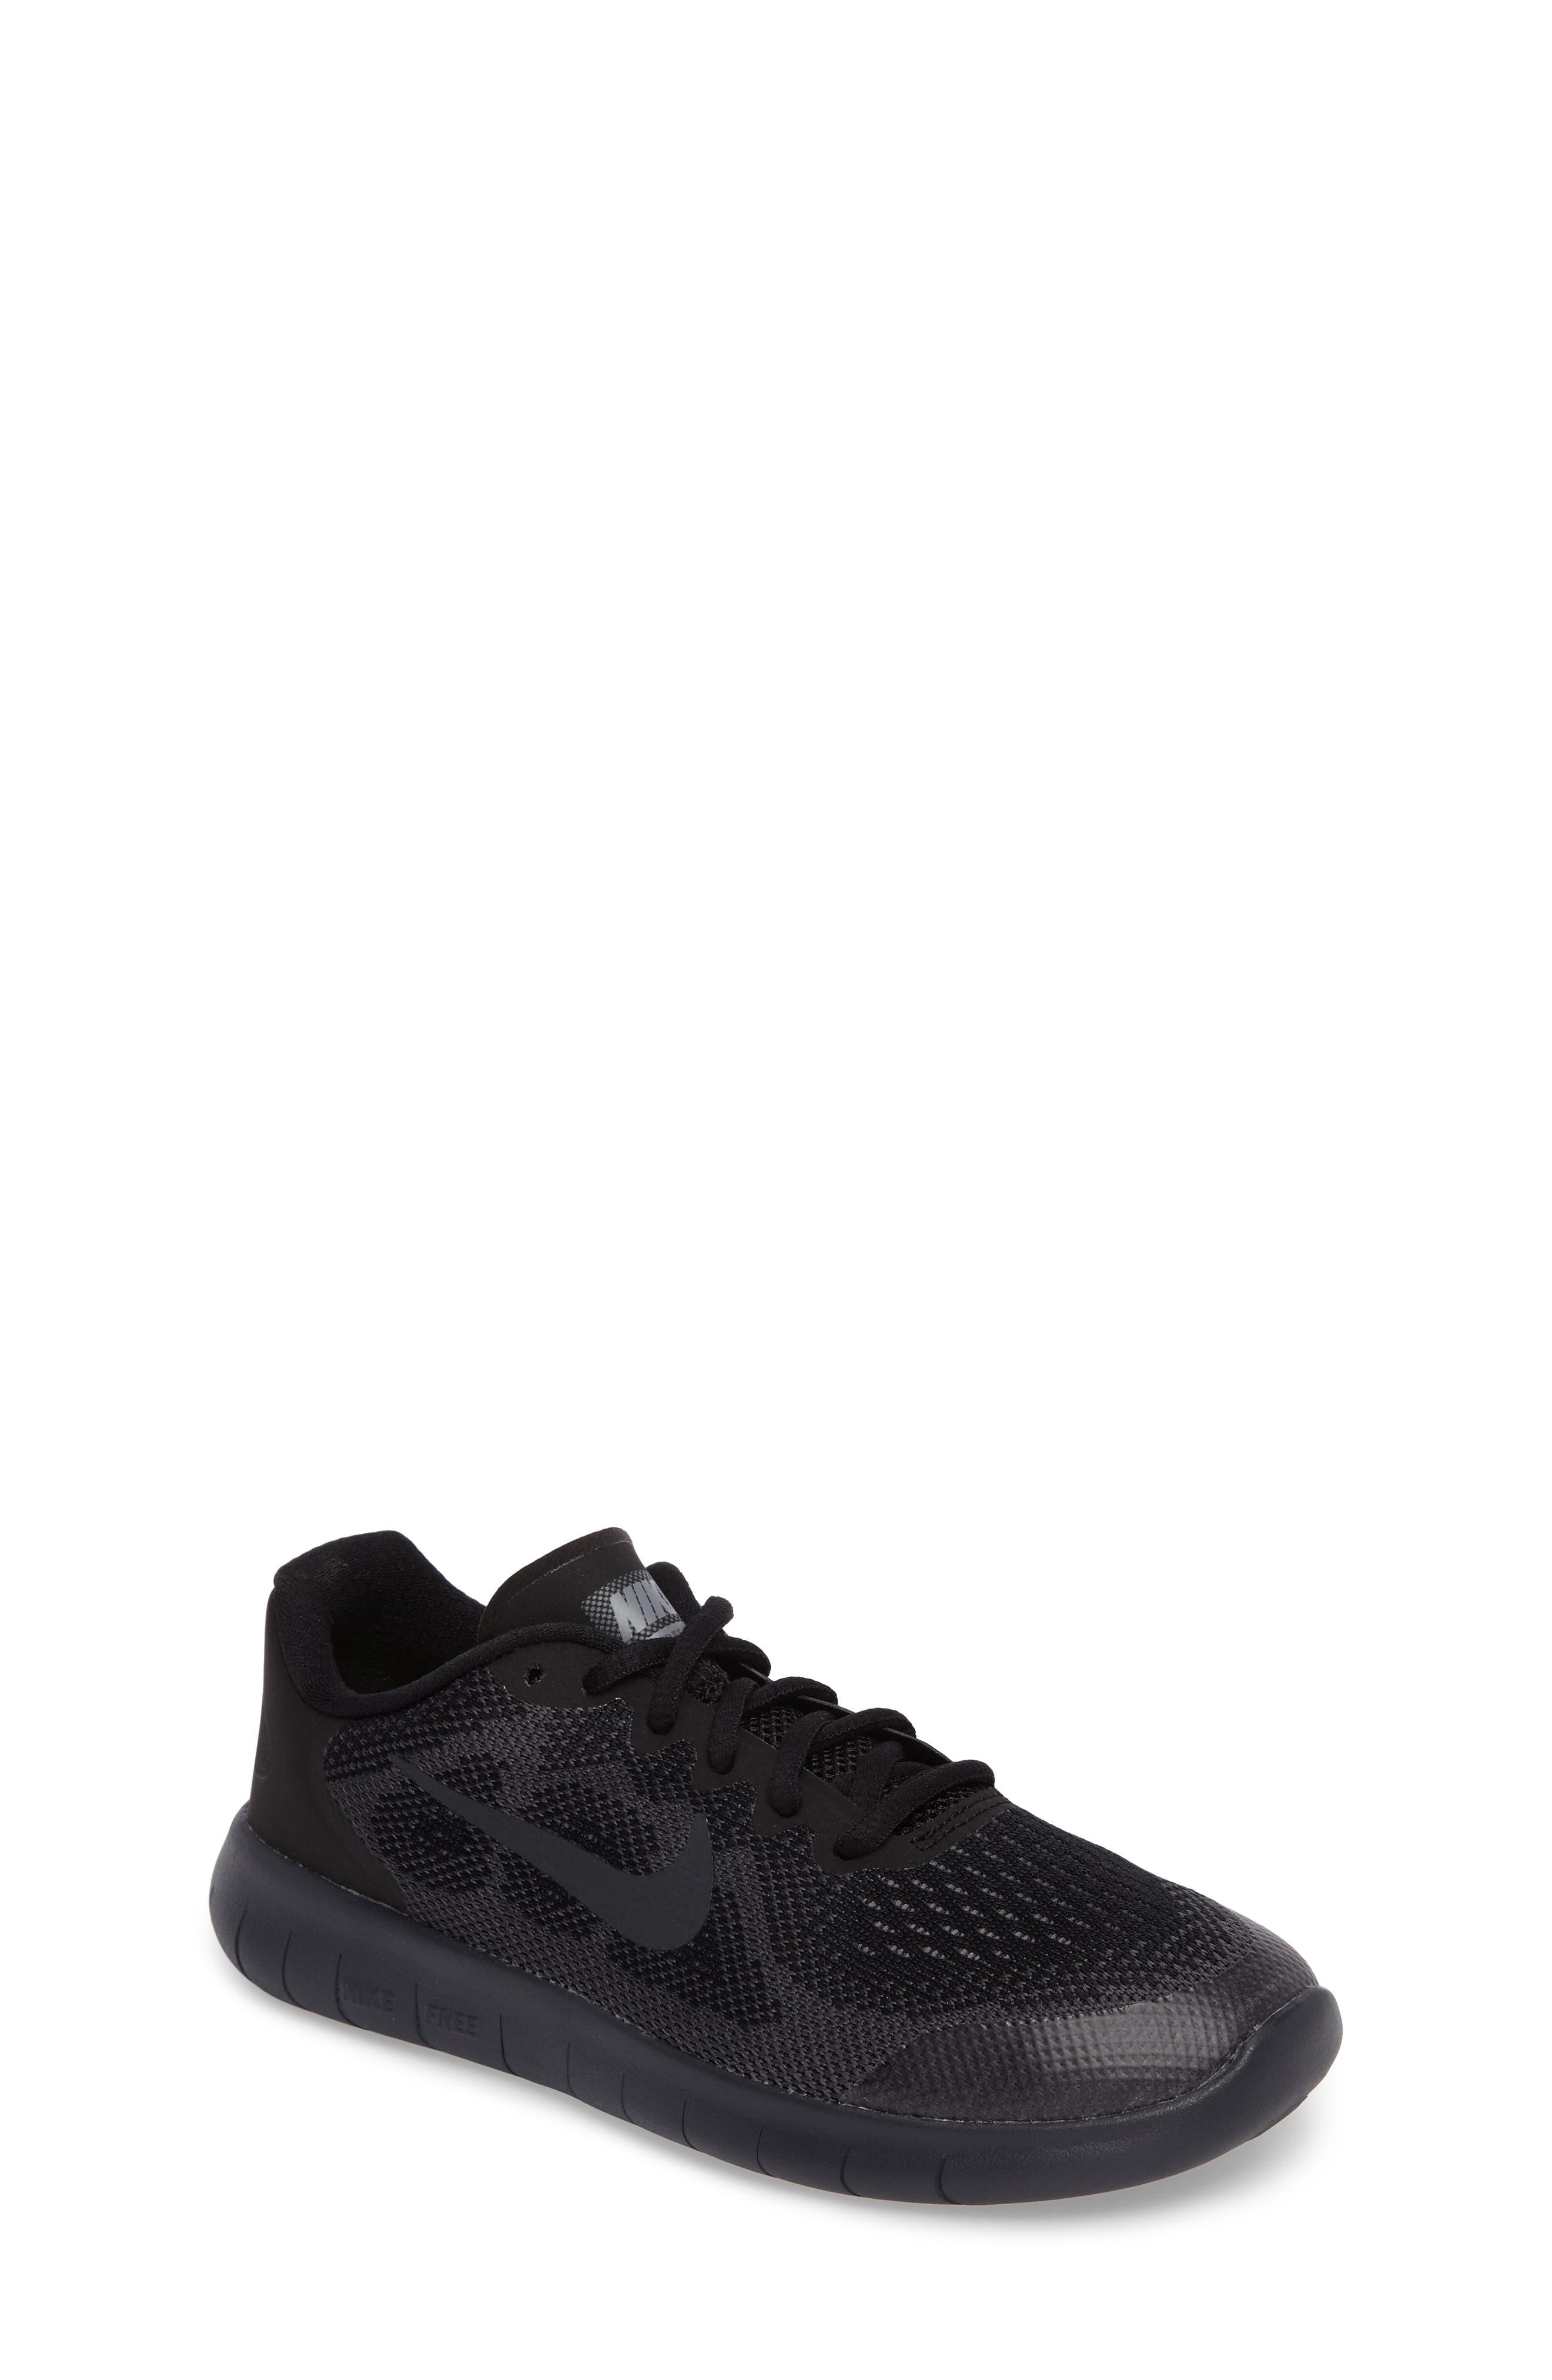 Free RN Running Shoe,                             Main thumbnail 1, color,                             Black/ Anthracite/ Dark Grey